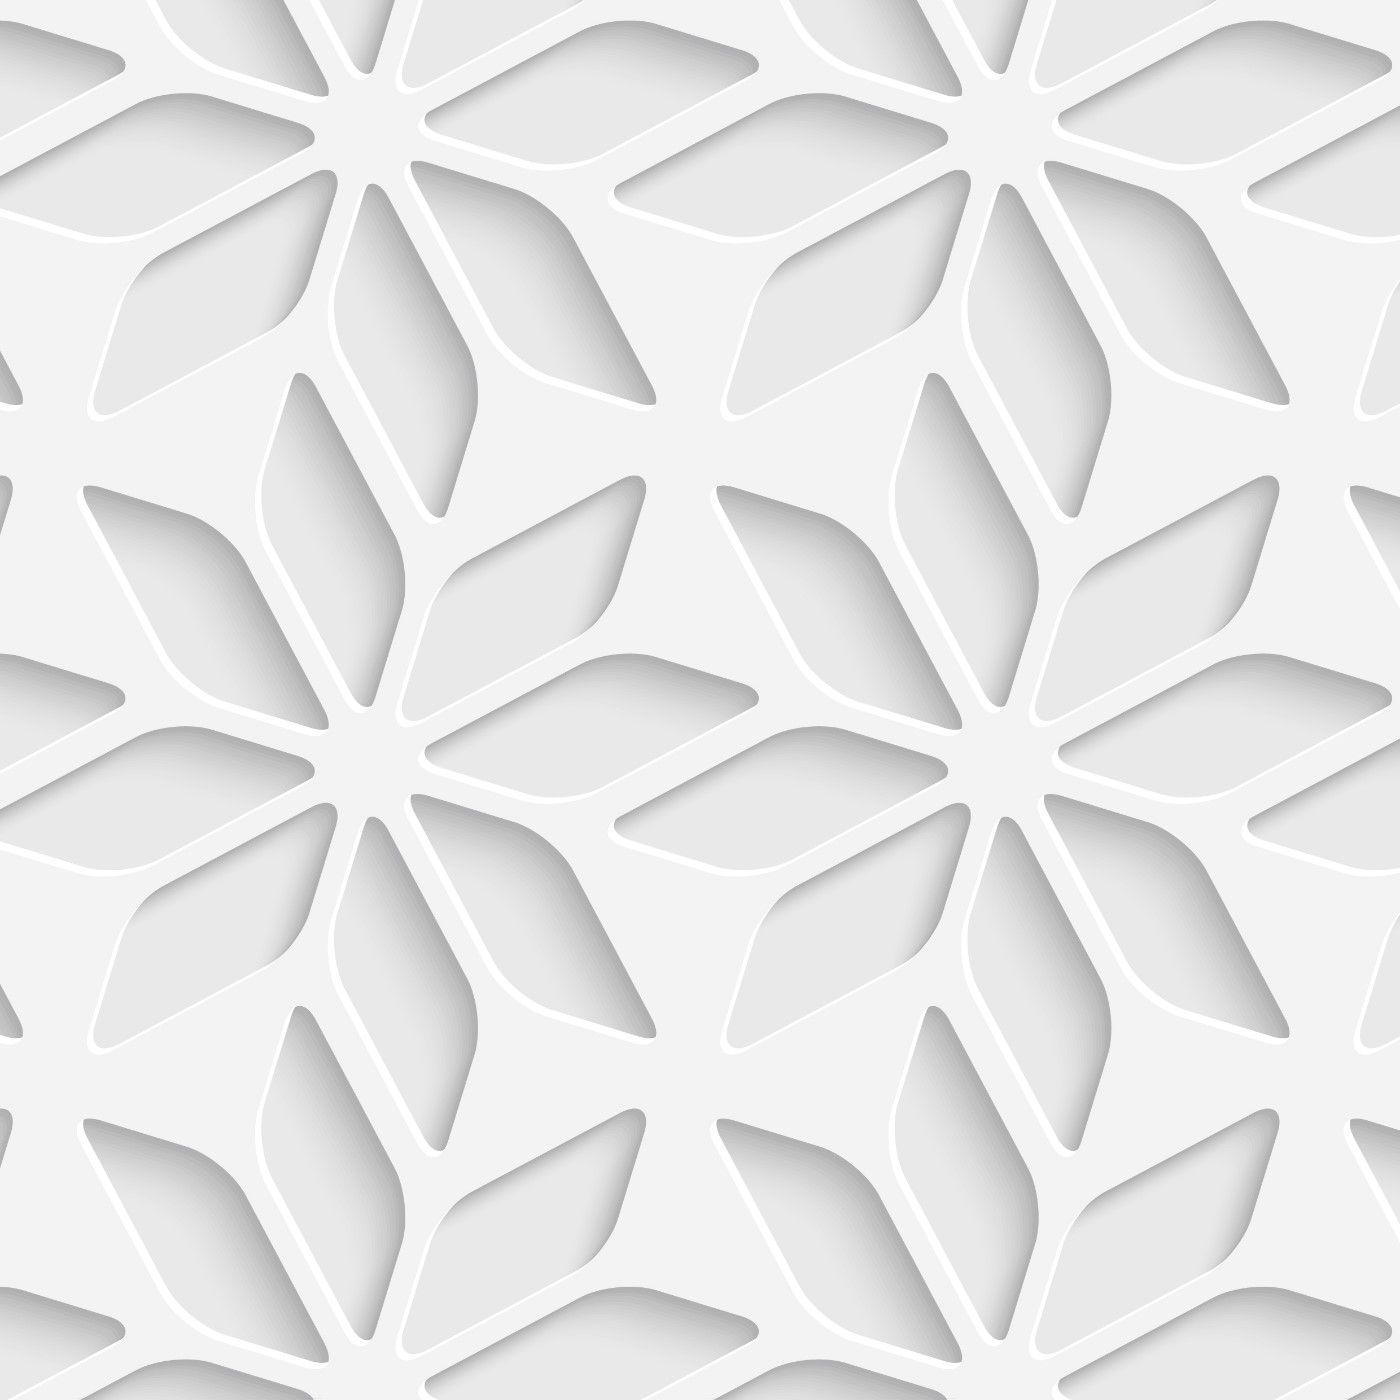 Papel de Parede Efeito 3D Lavável CO-716 - Cole Aí